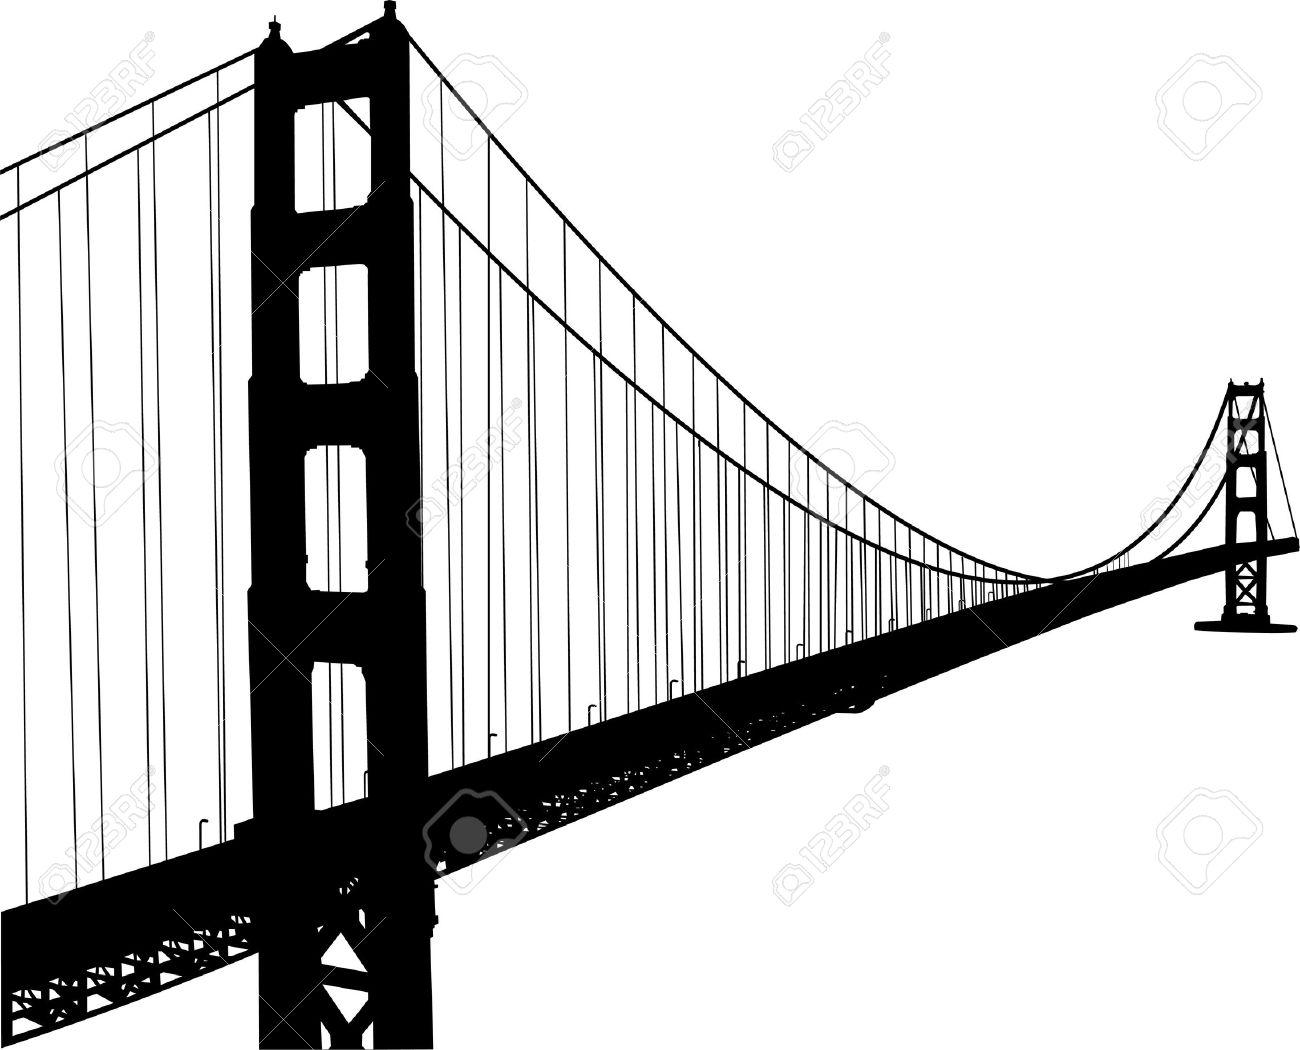 Bridge Clipart Black And White Free Download Best Bridge